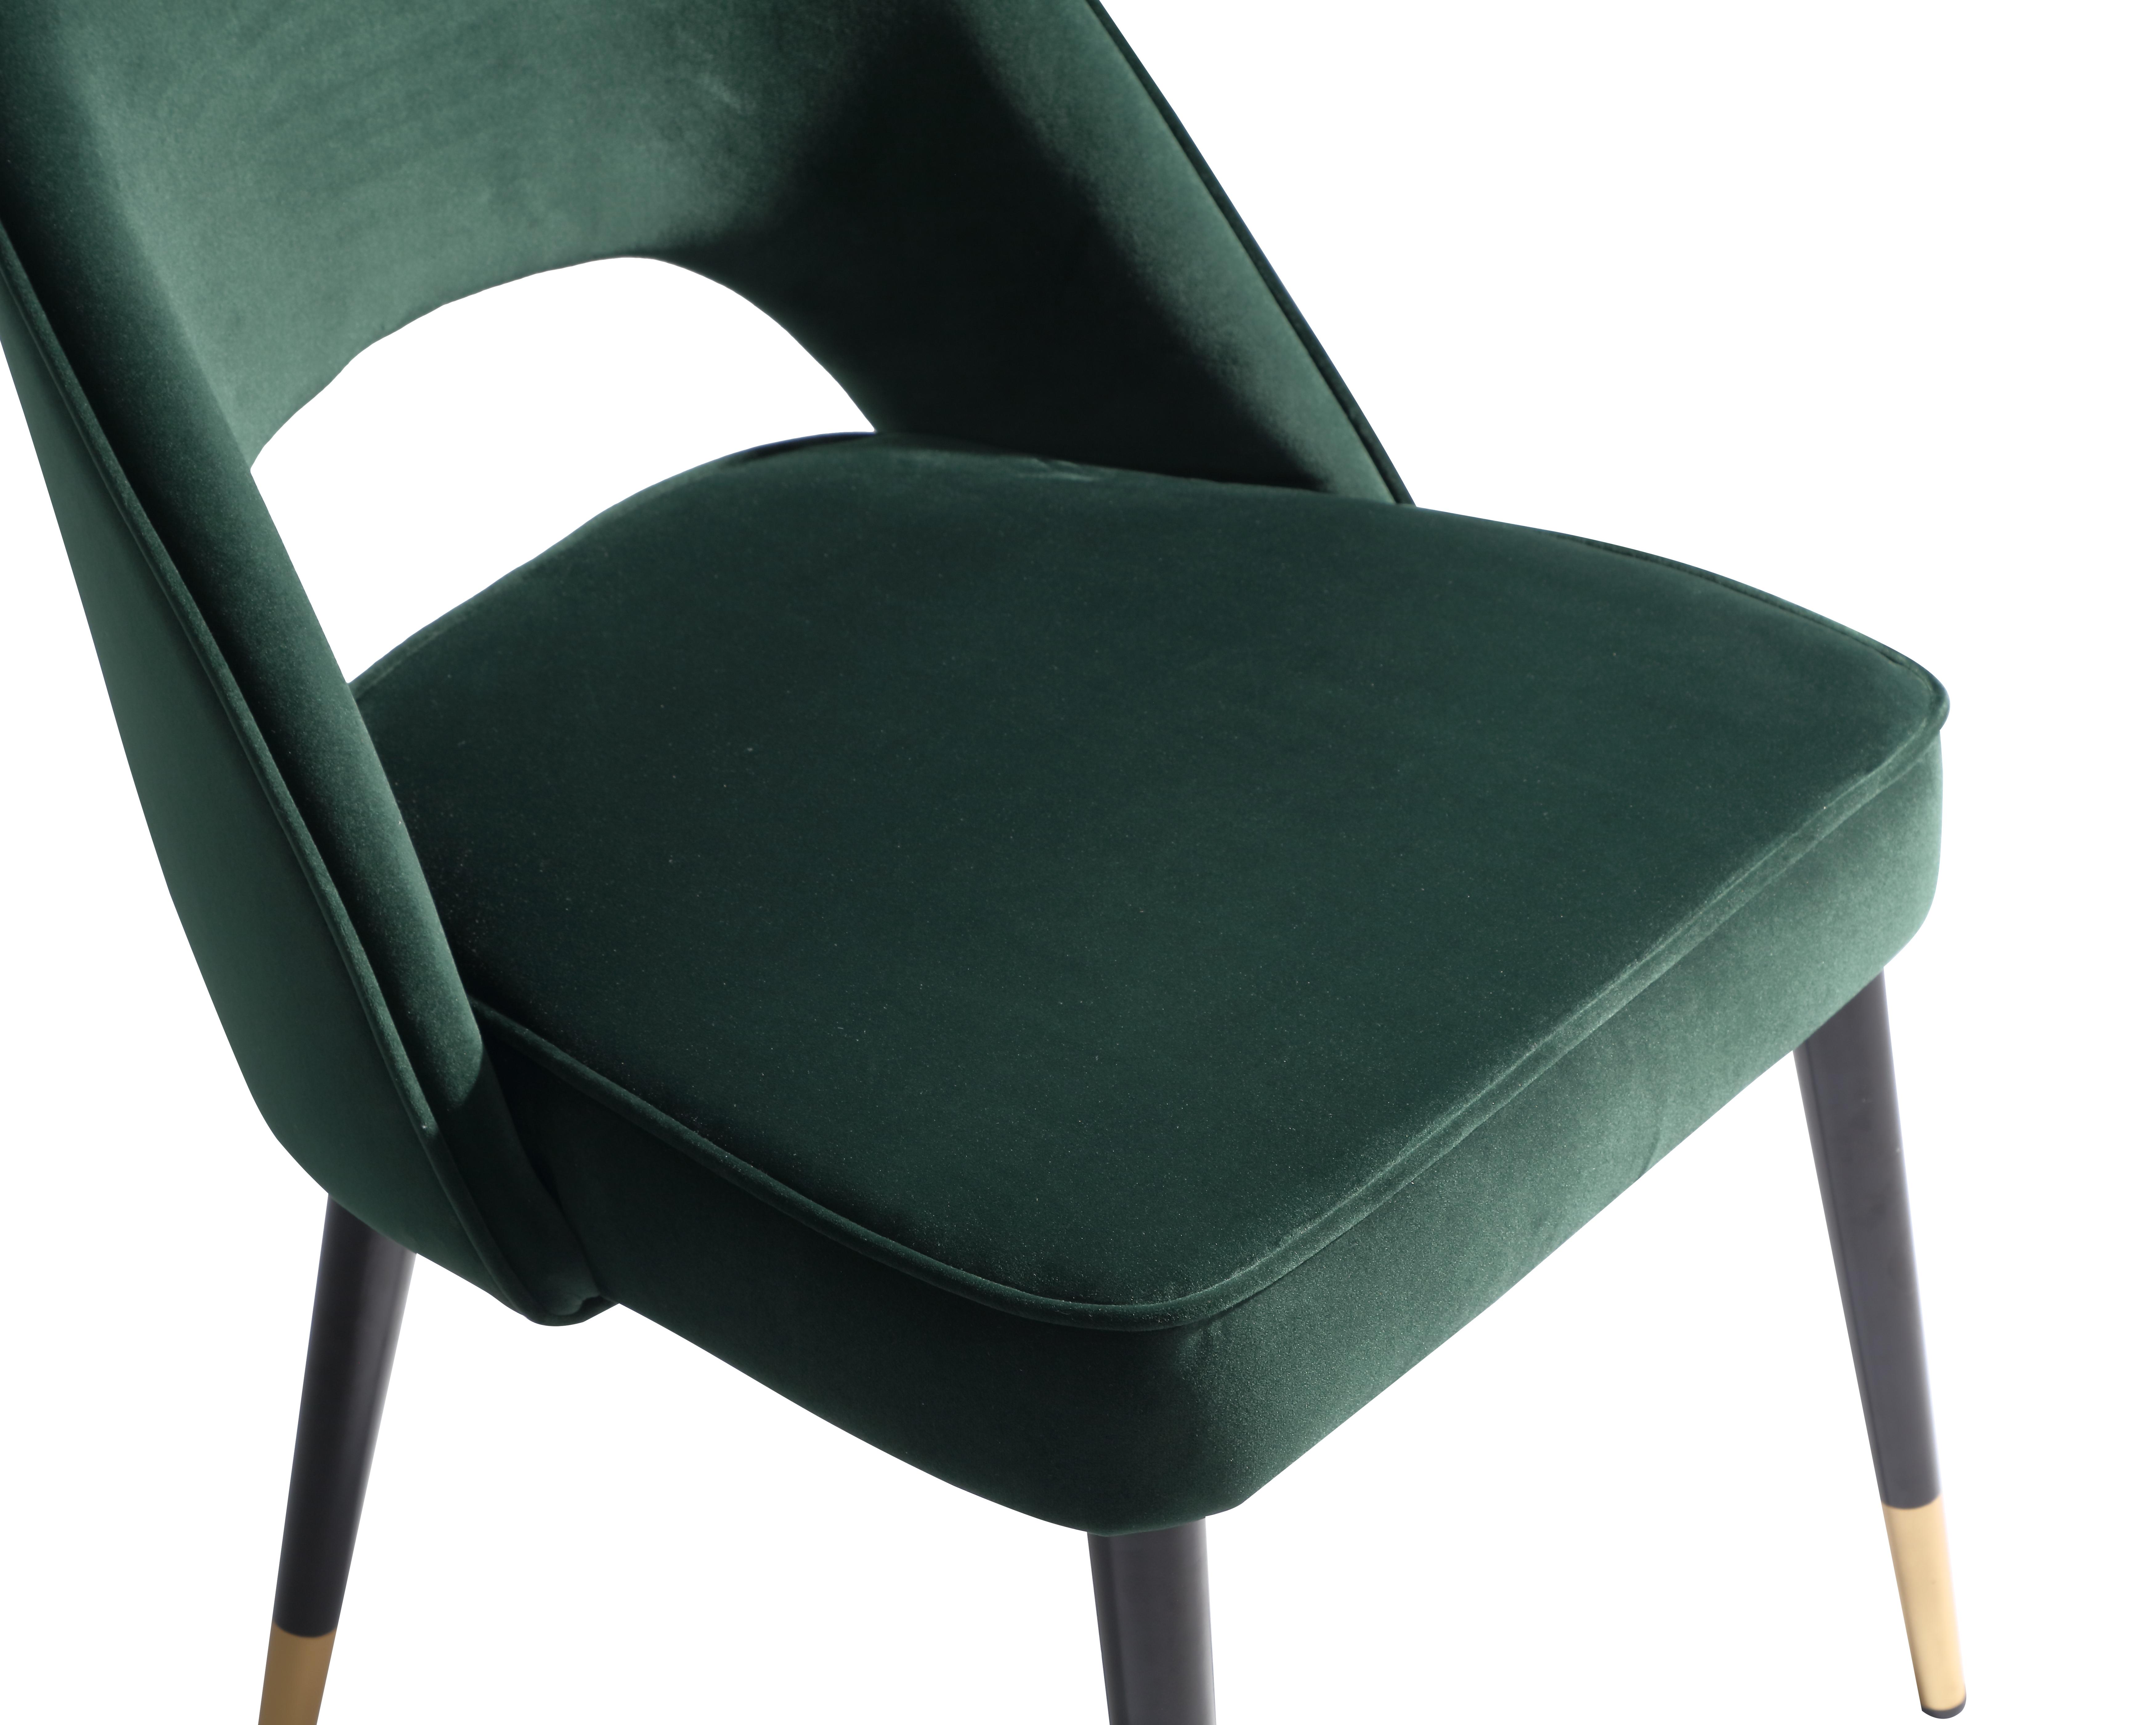 Liang & Eimil GV-DCH-006 Yvees Chair (5)